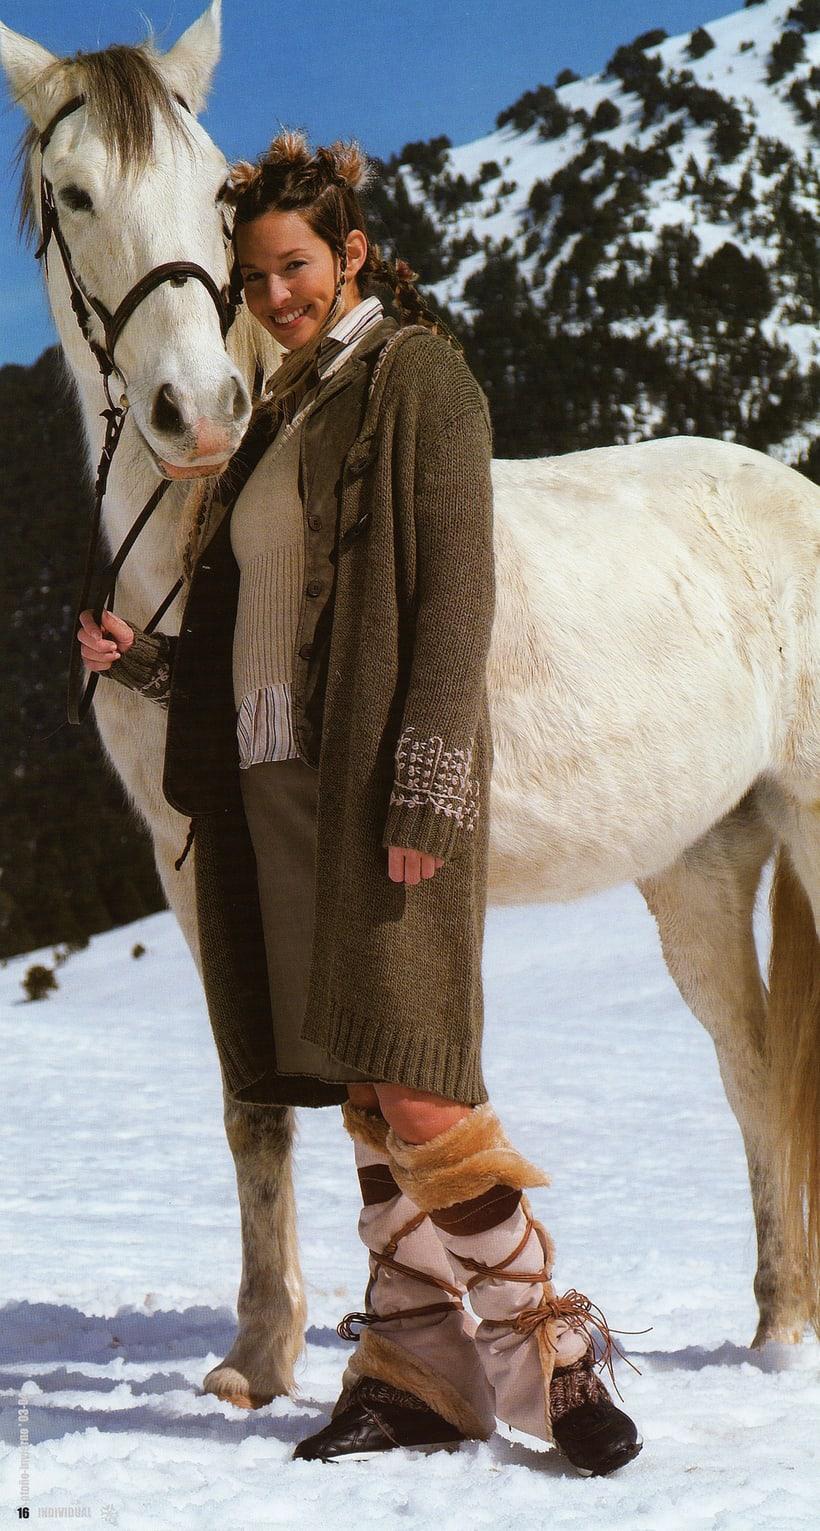 Cold Alaska / Otoño-Invierno 2003-04 6